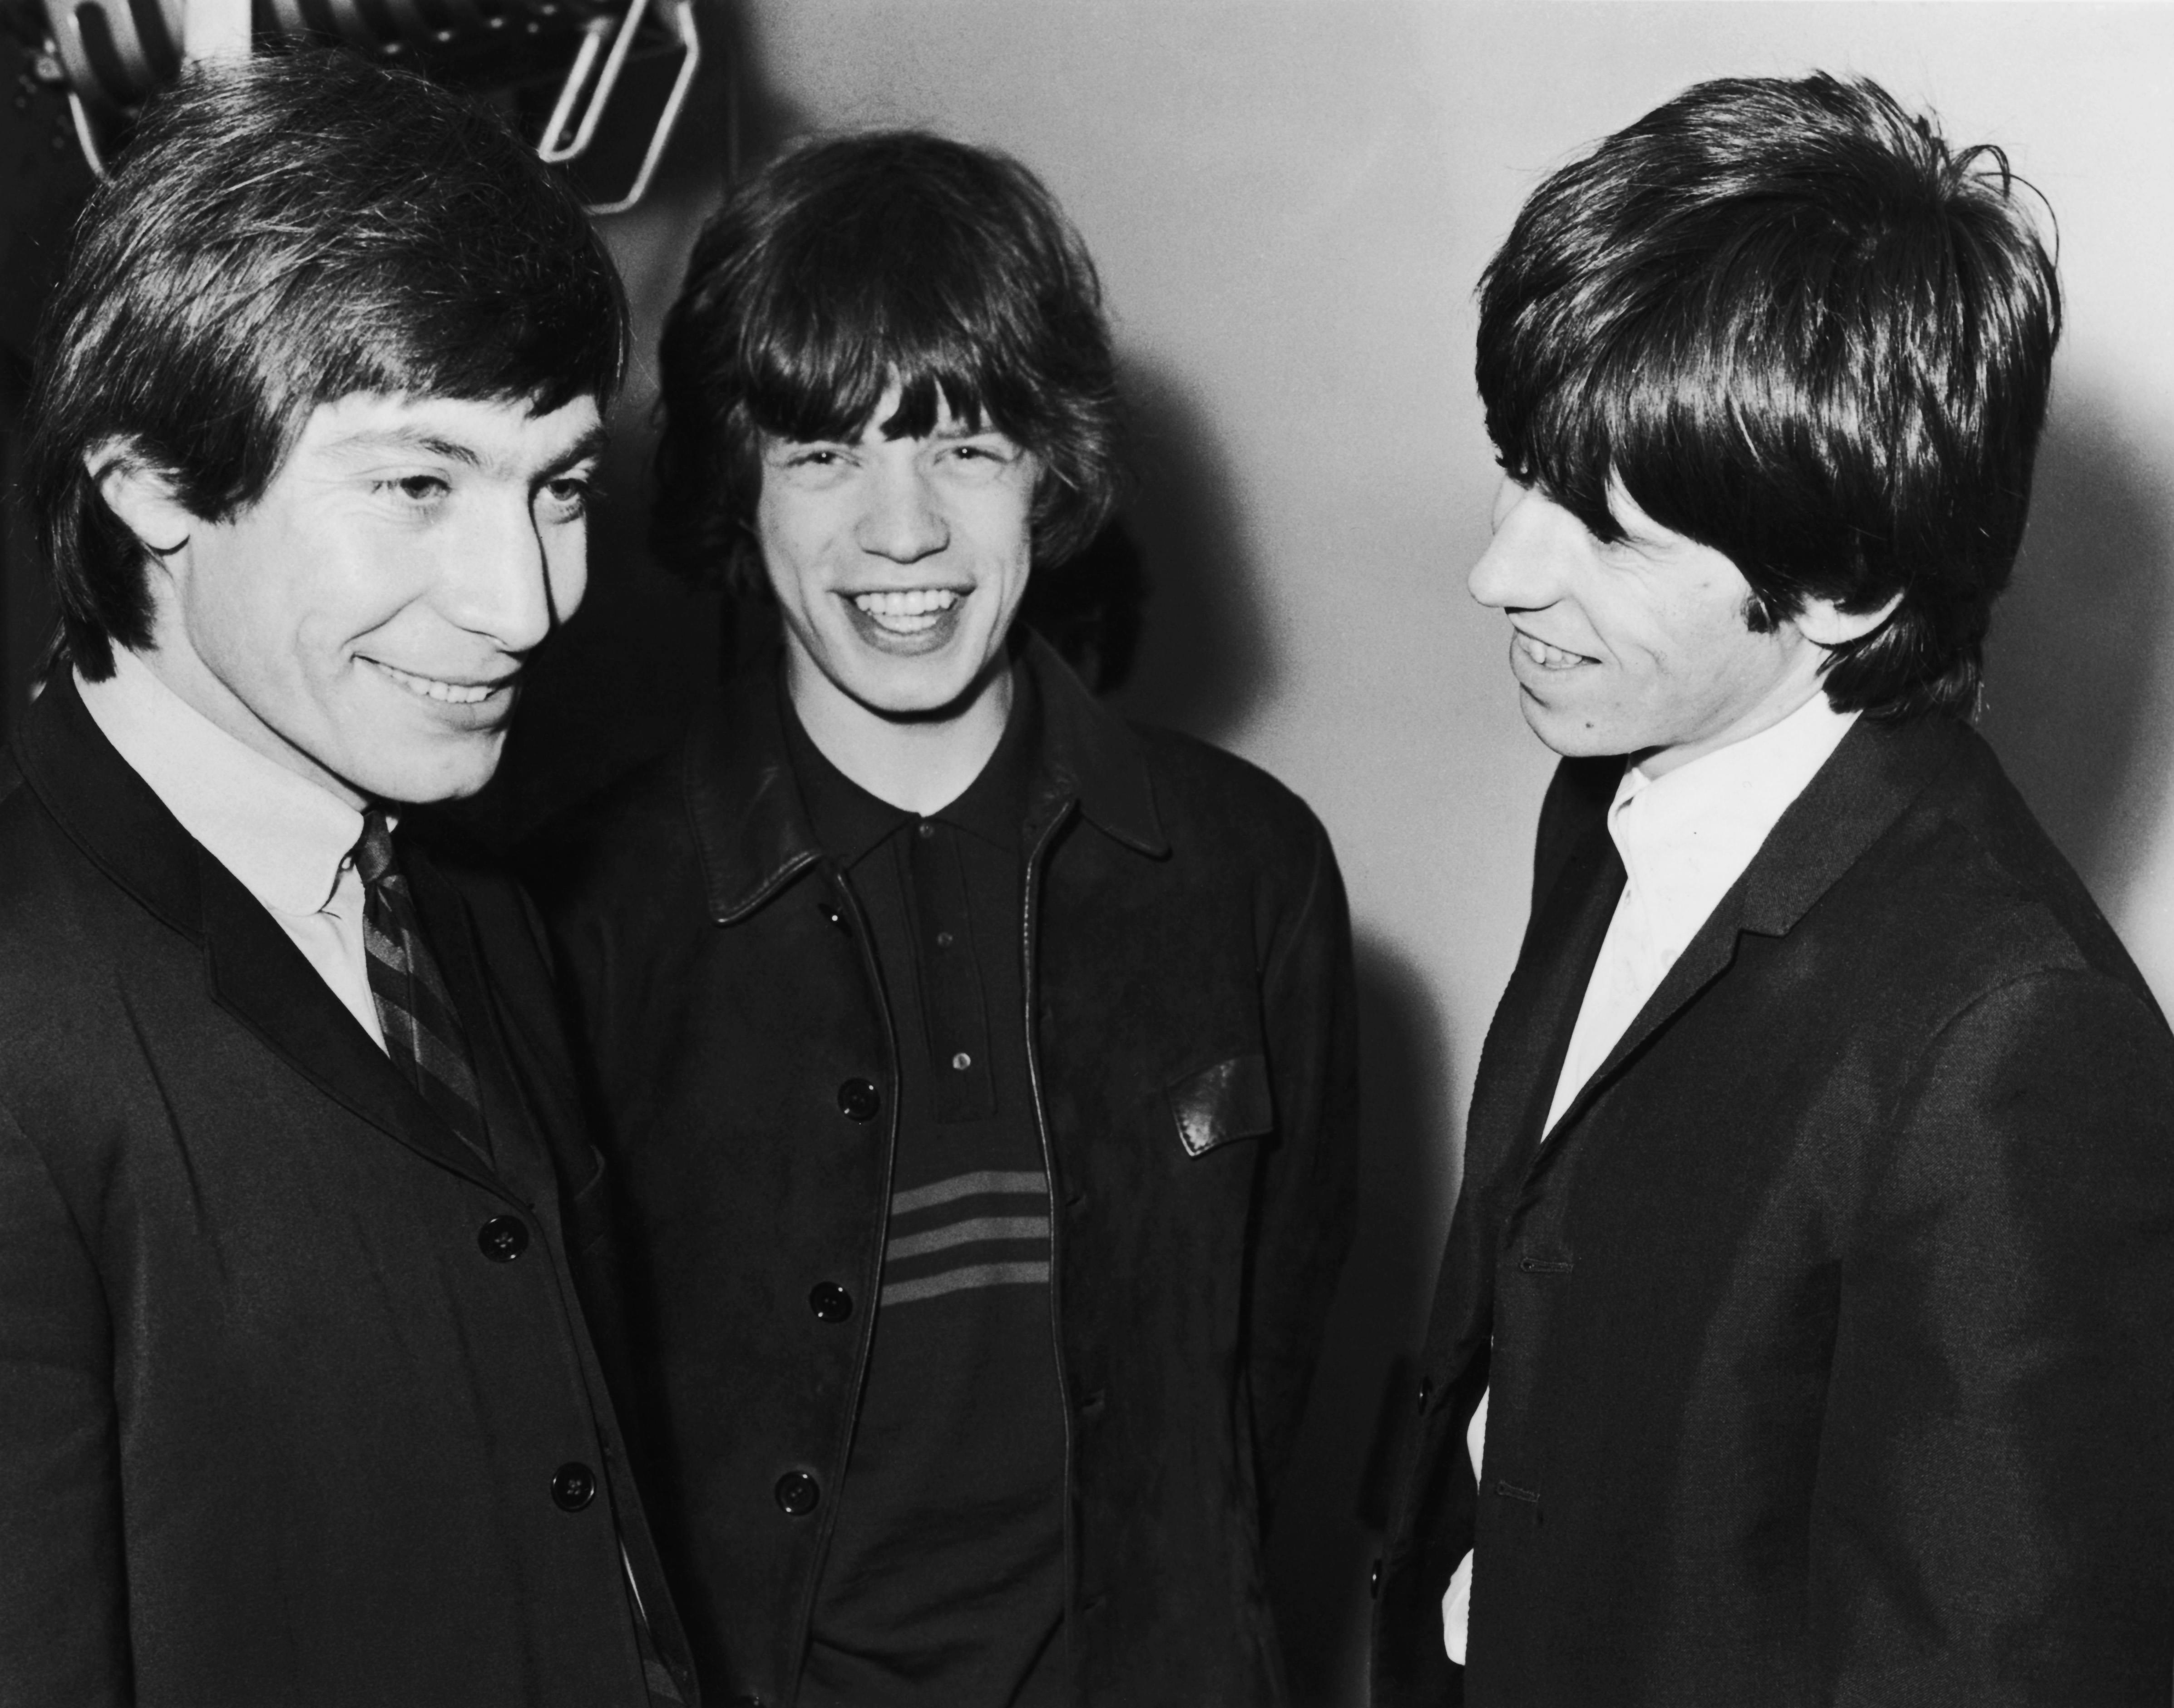 Mick Jagger in 1964